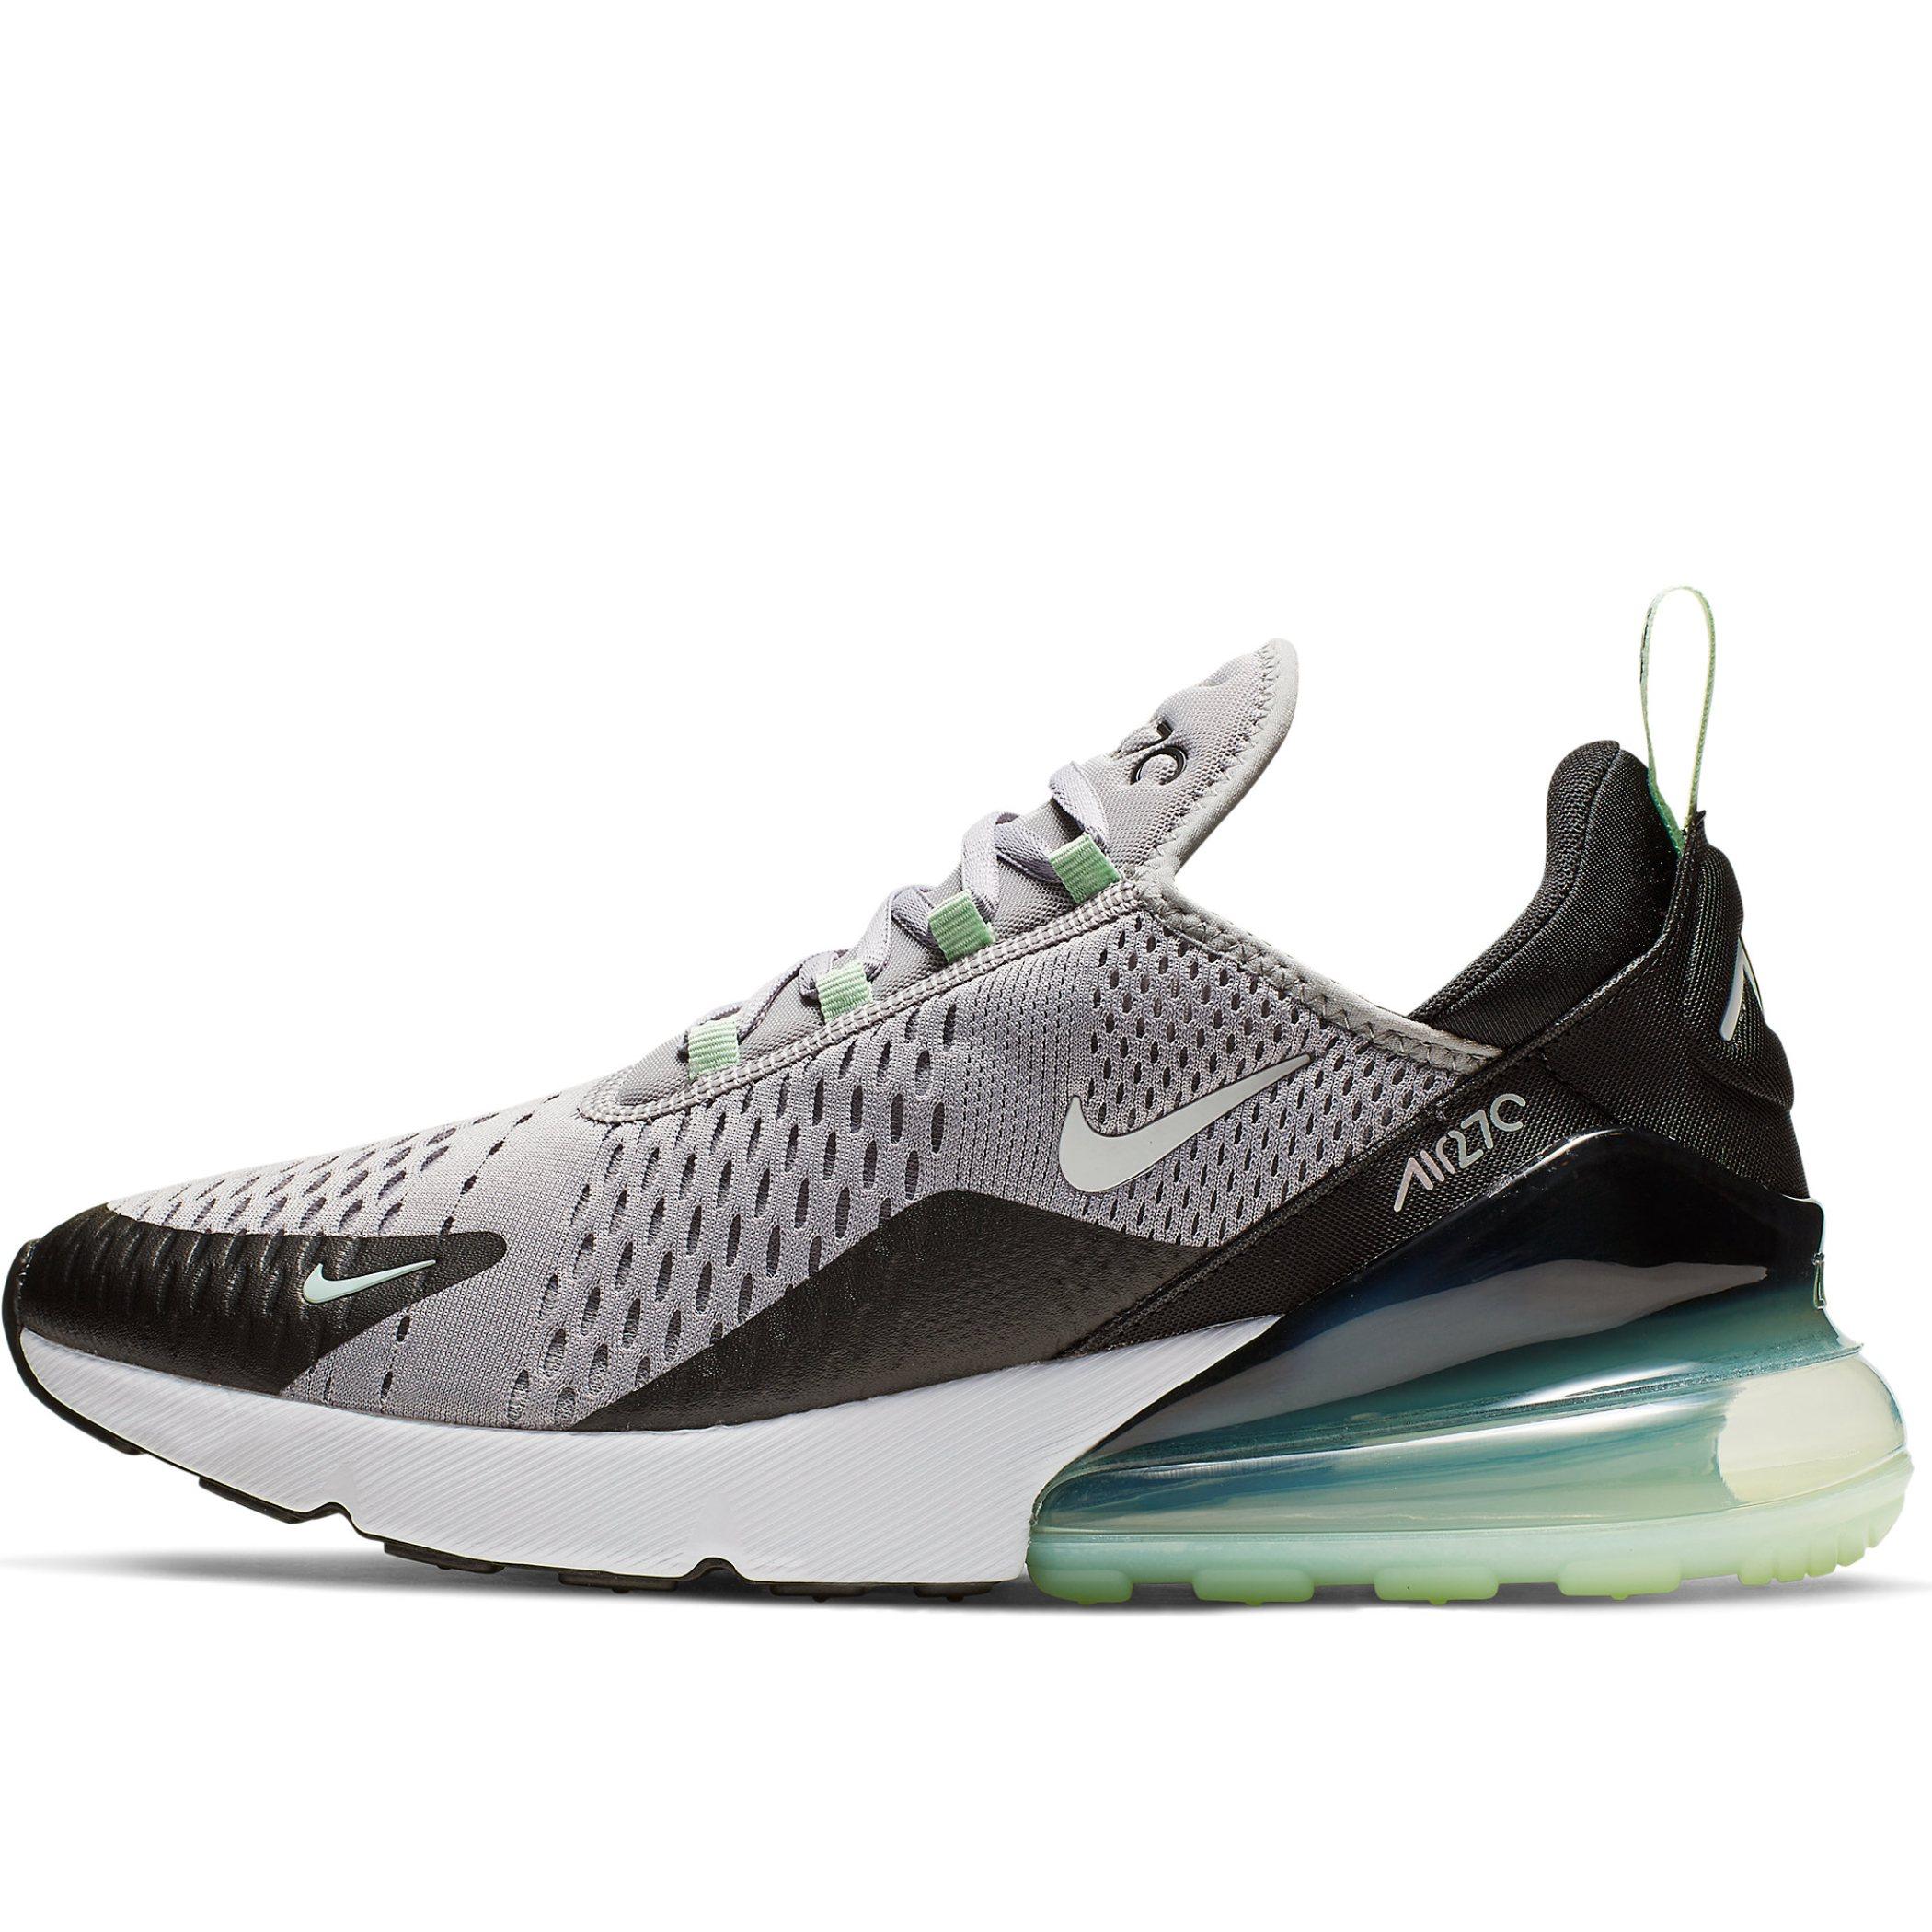 313a4e94 Мужские кроссовки Nike Air Max 270 Atmosphere Grey/White-Fresh Mint-Black -